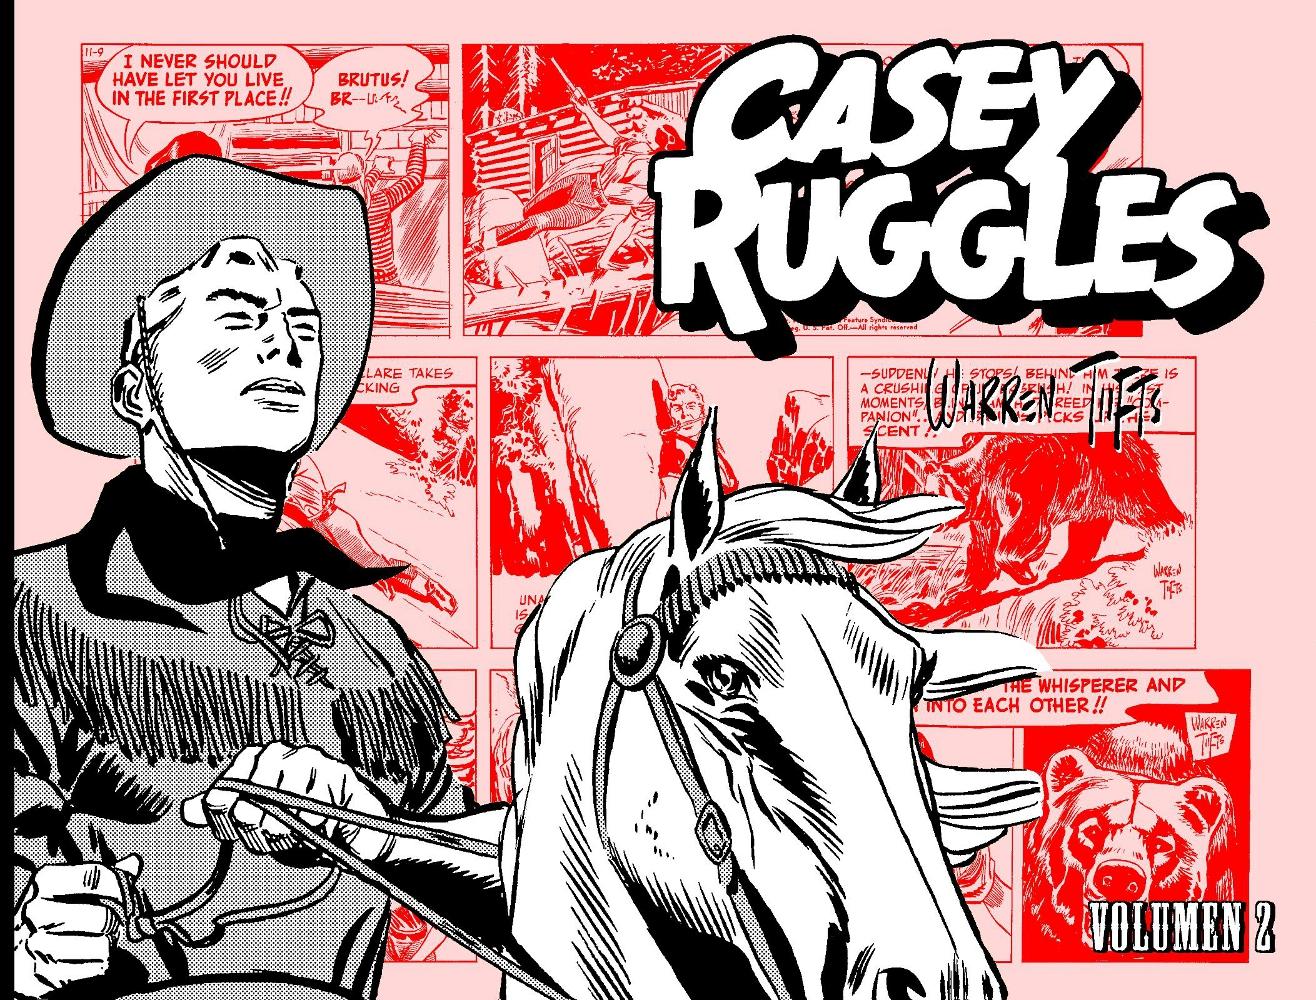 caseyruggles2